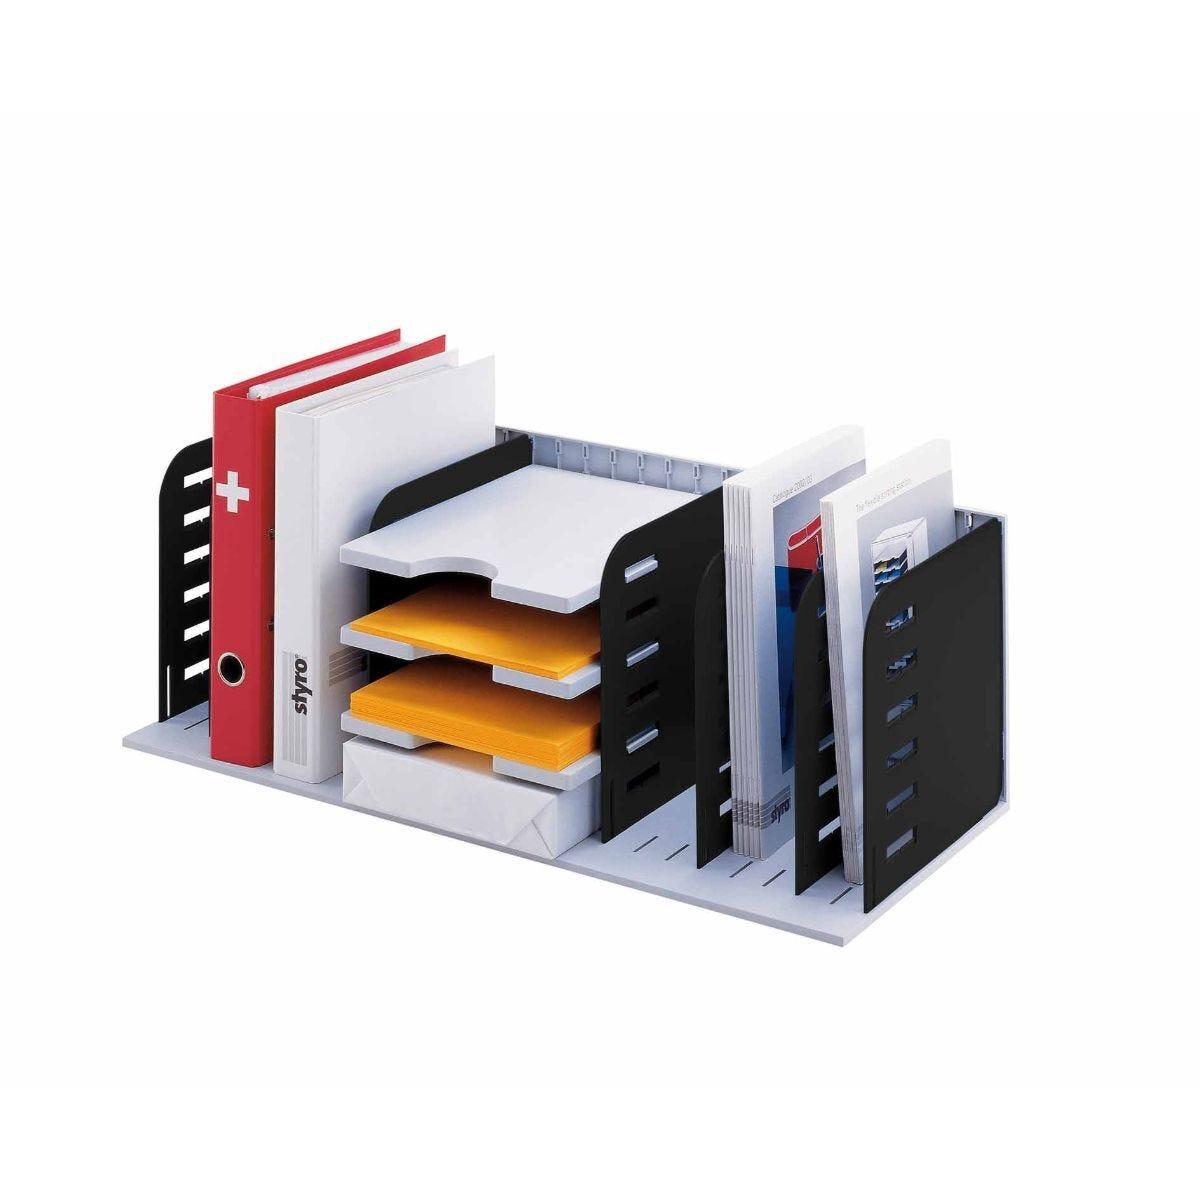 Styrorac Vertical Desktop Organiser 8 Compartments with Shelving